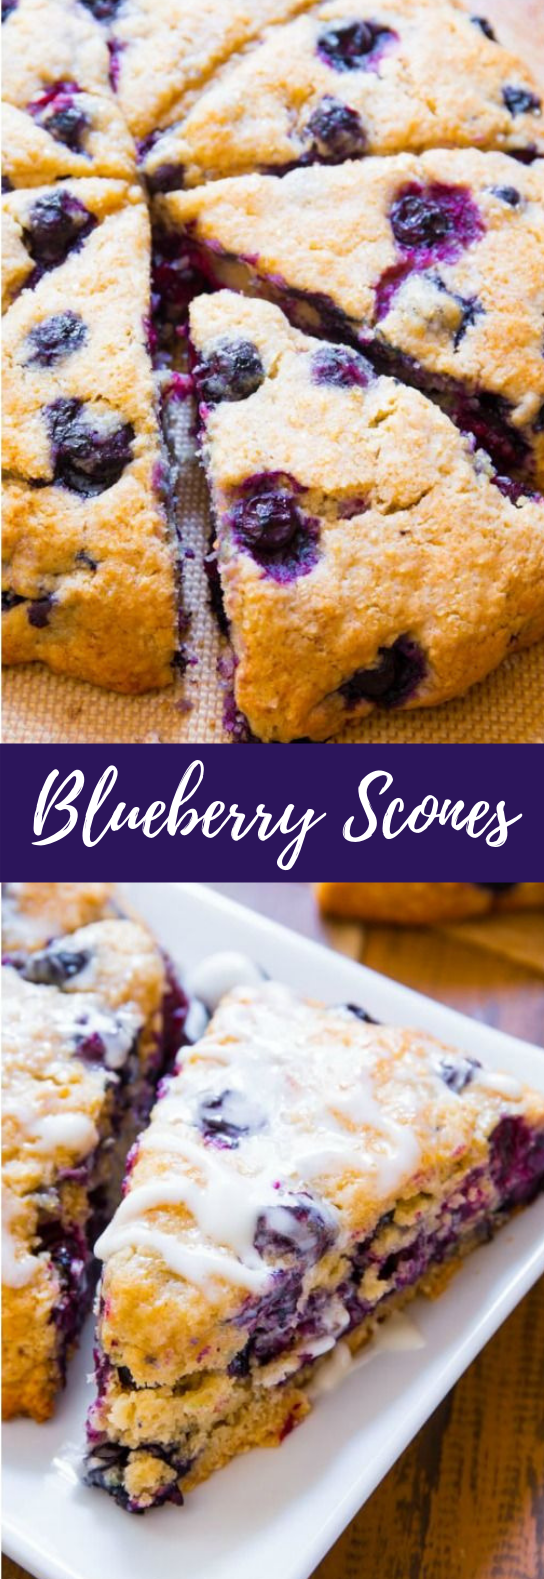 My Favorite Blueberry Scones #Dessert #Sweet